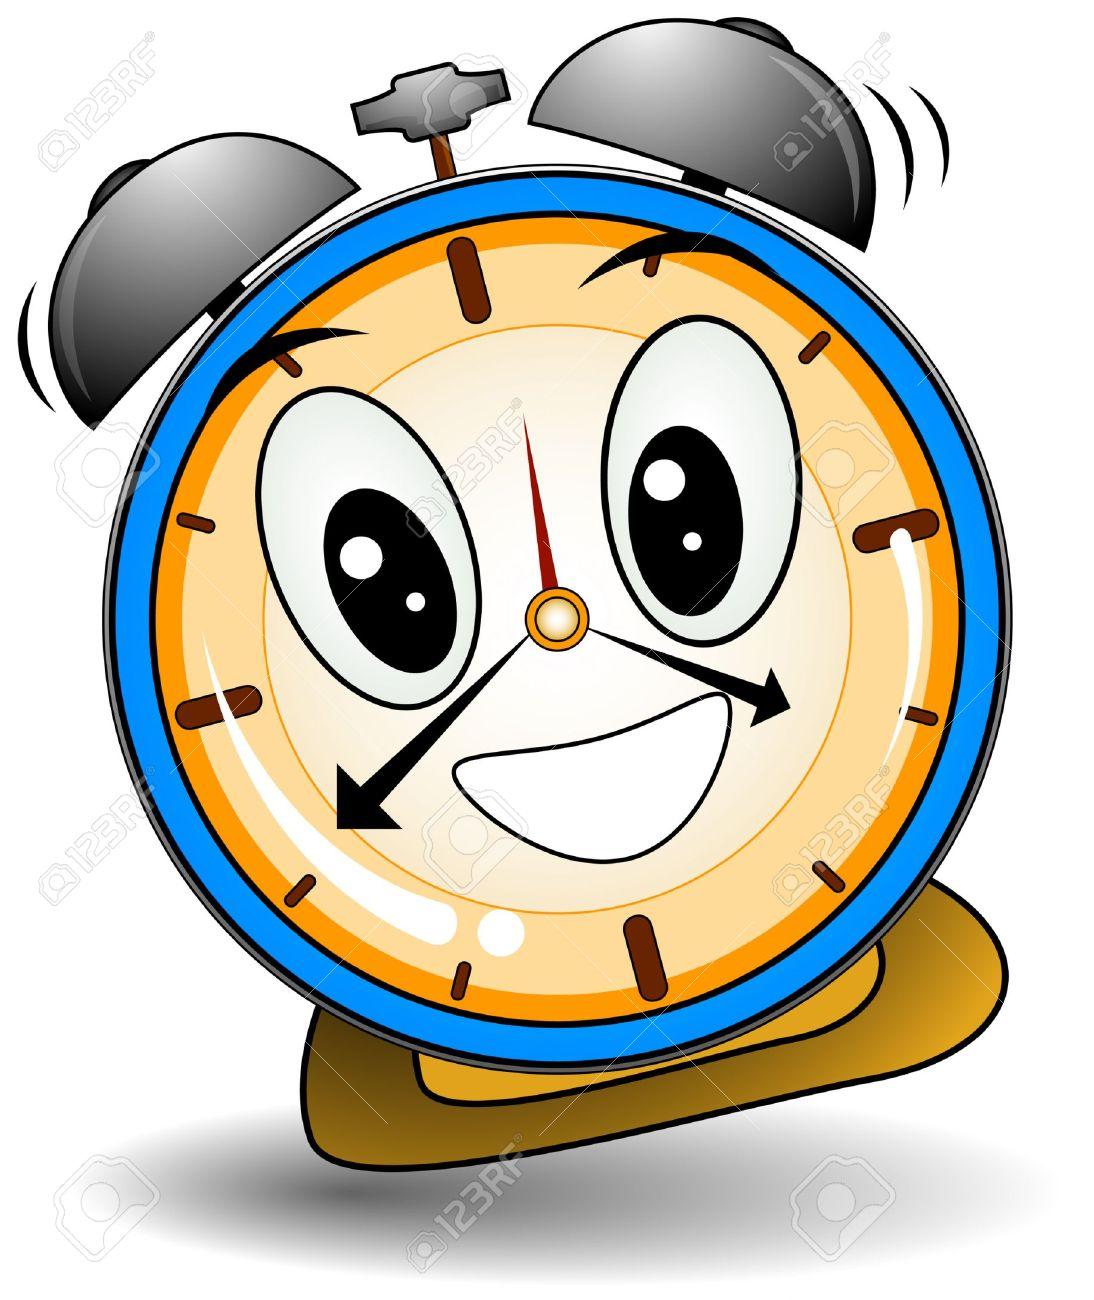 Cartoon alarm clock clipart